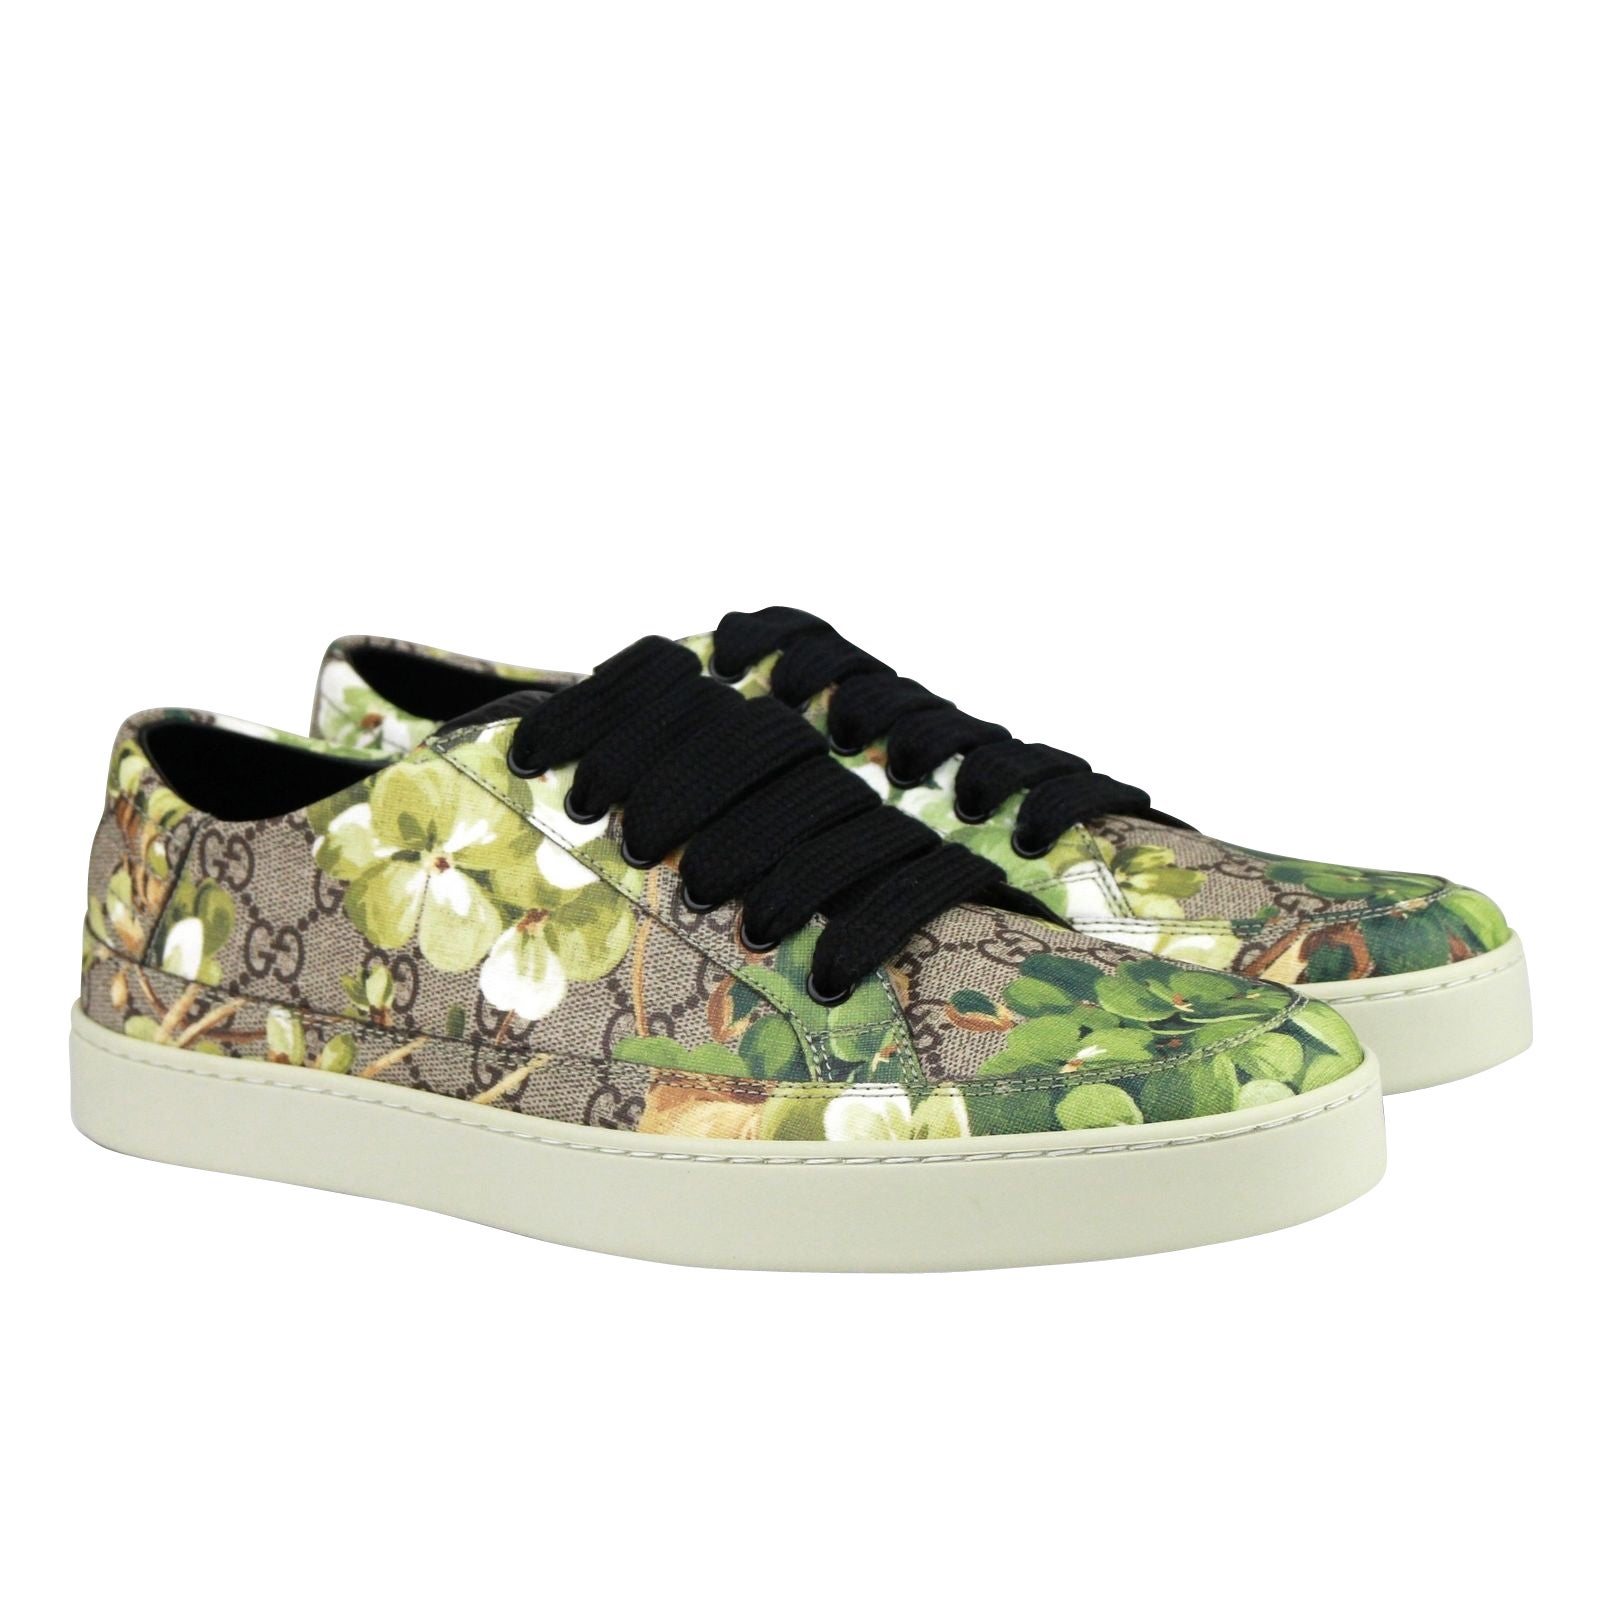 Gucci Men's Bloom Flower Print Supreme